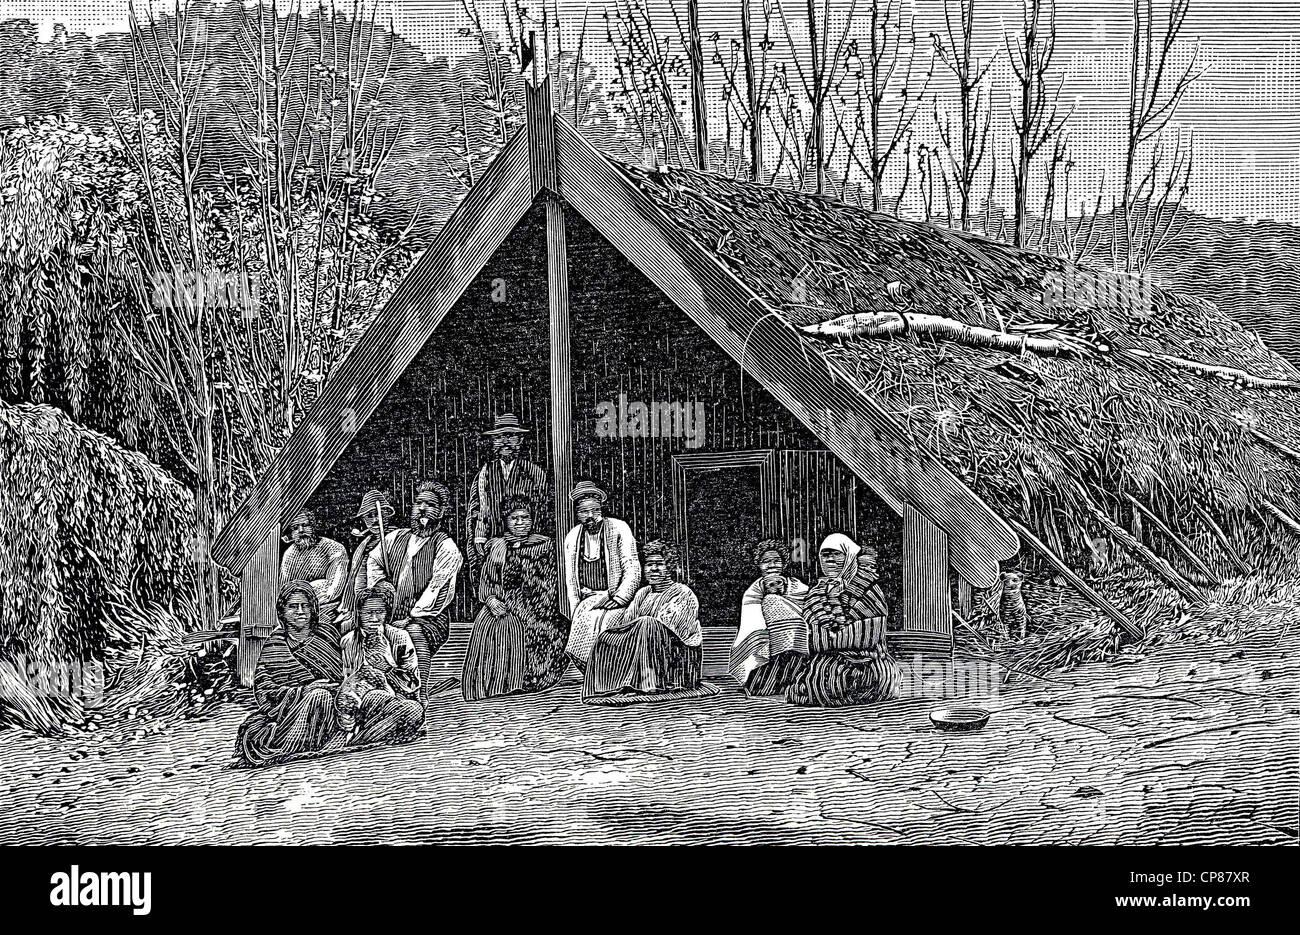 Capanna Maori, Nuova Zelanda, incisione storica del XIX secolo, Eine Hütte der Maori, Neuseeland, historischer Immagini Stock